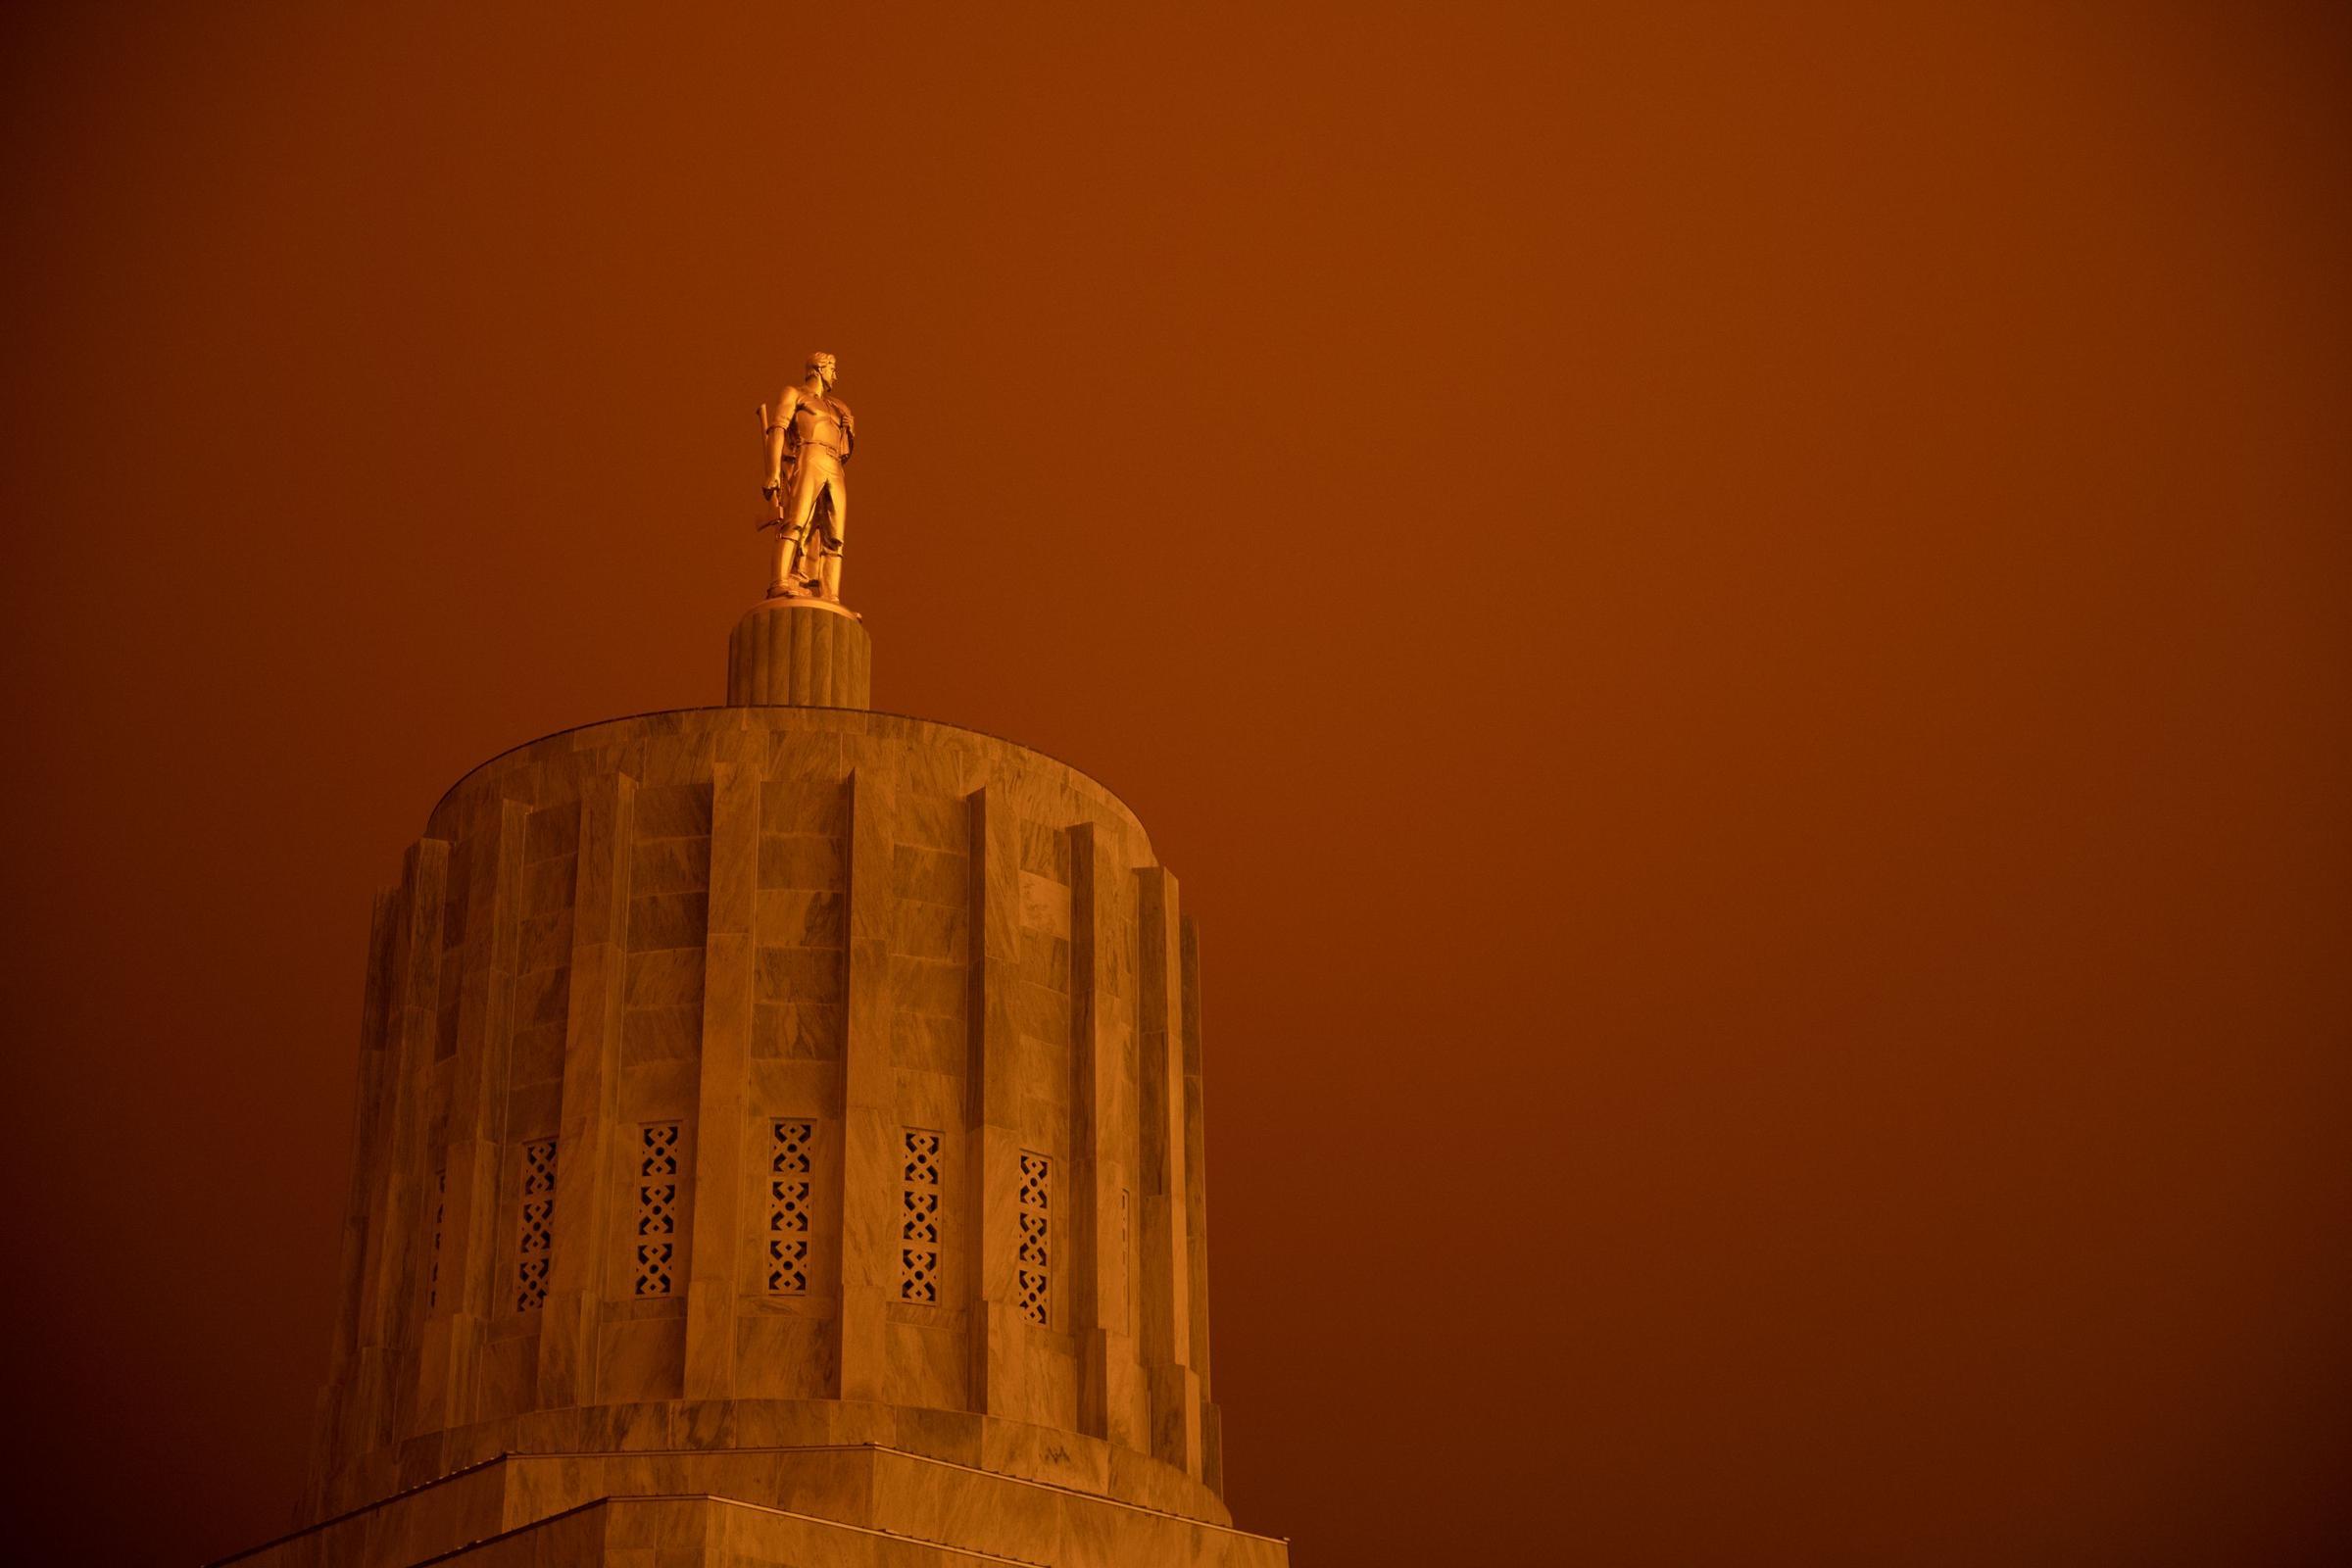 California wildfires: Three die as blazes continue raging